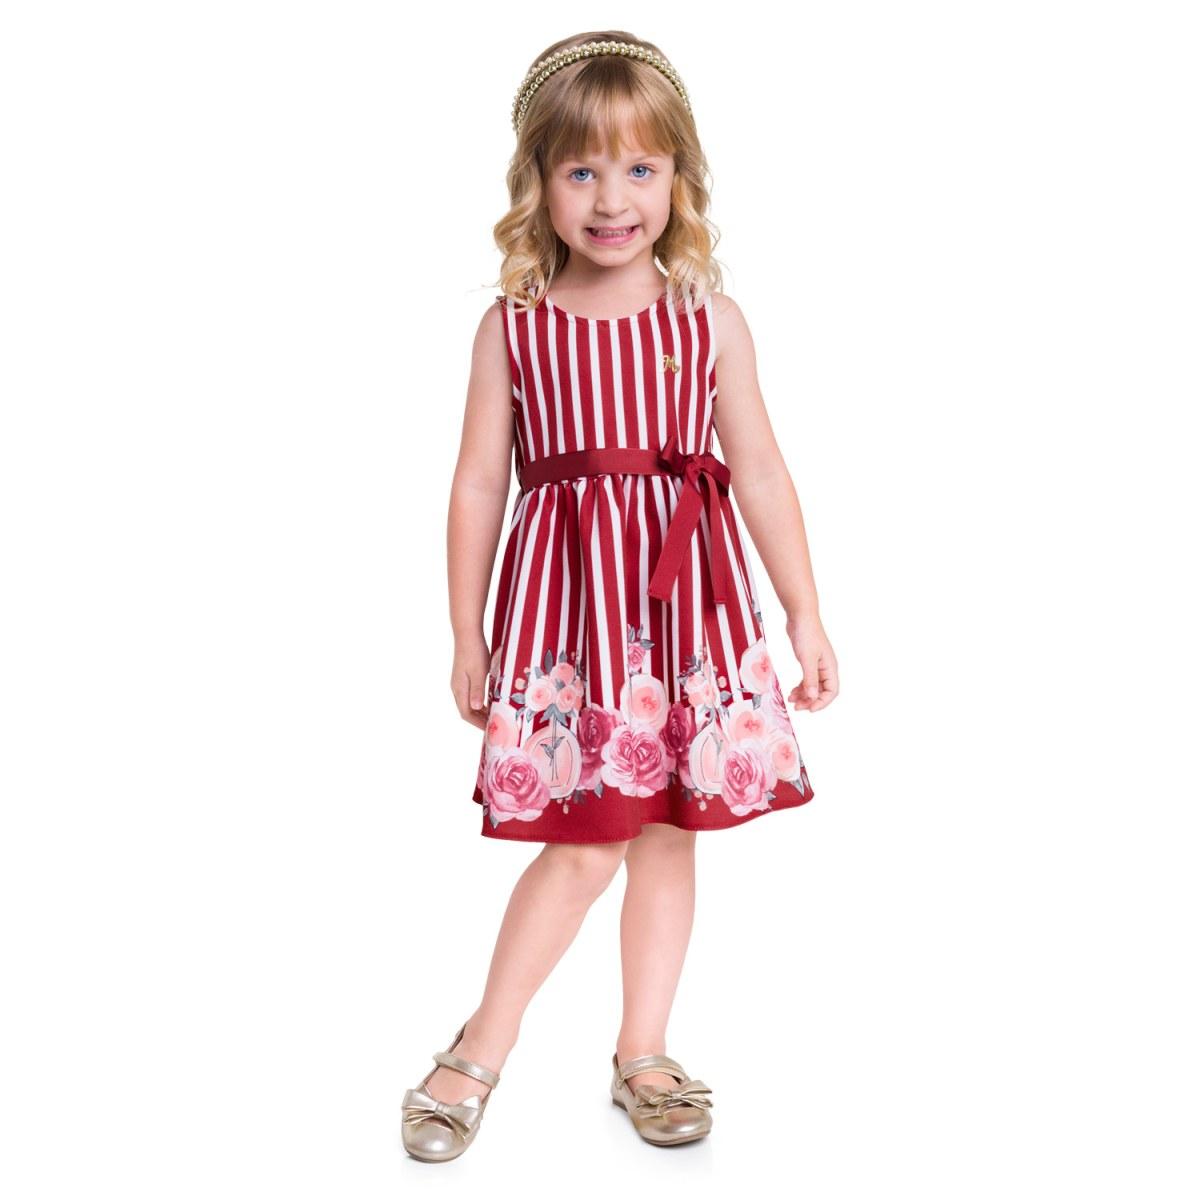 Vestido Regata Menina Milon em Alfaiataria